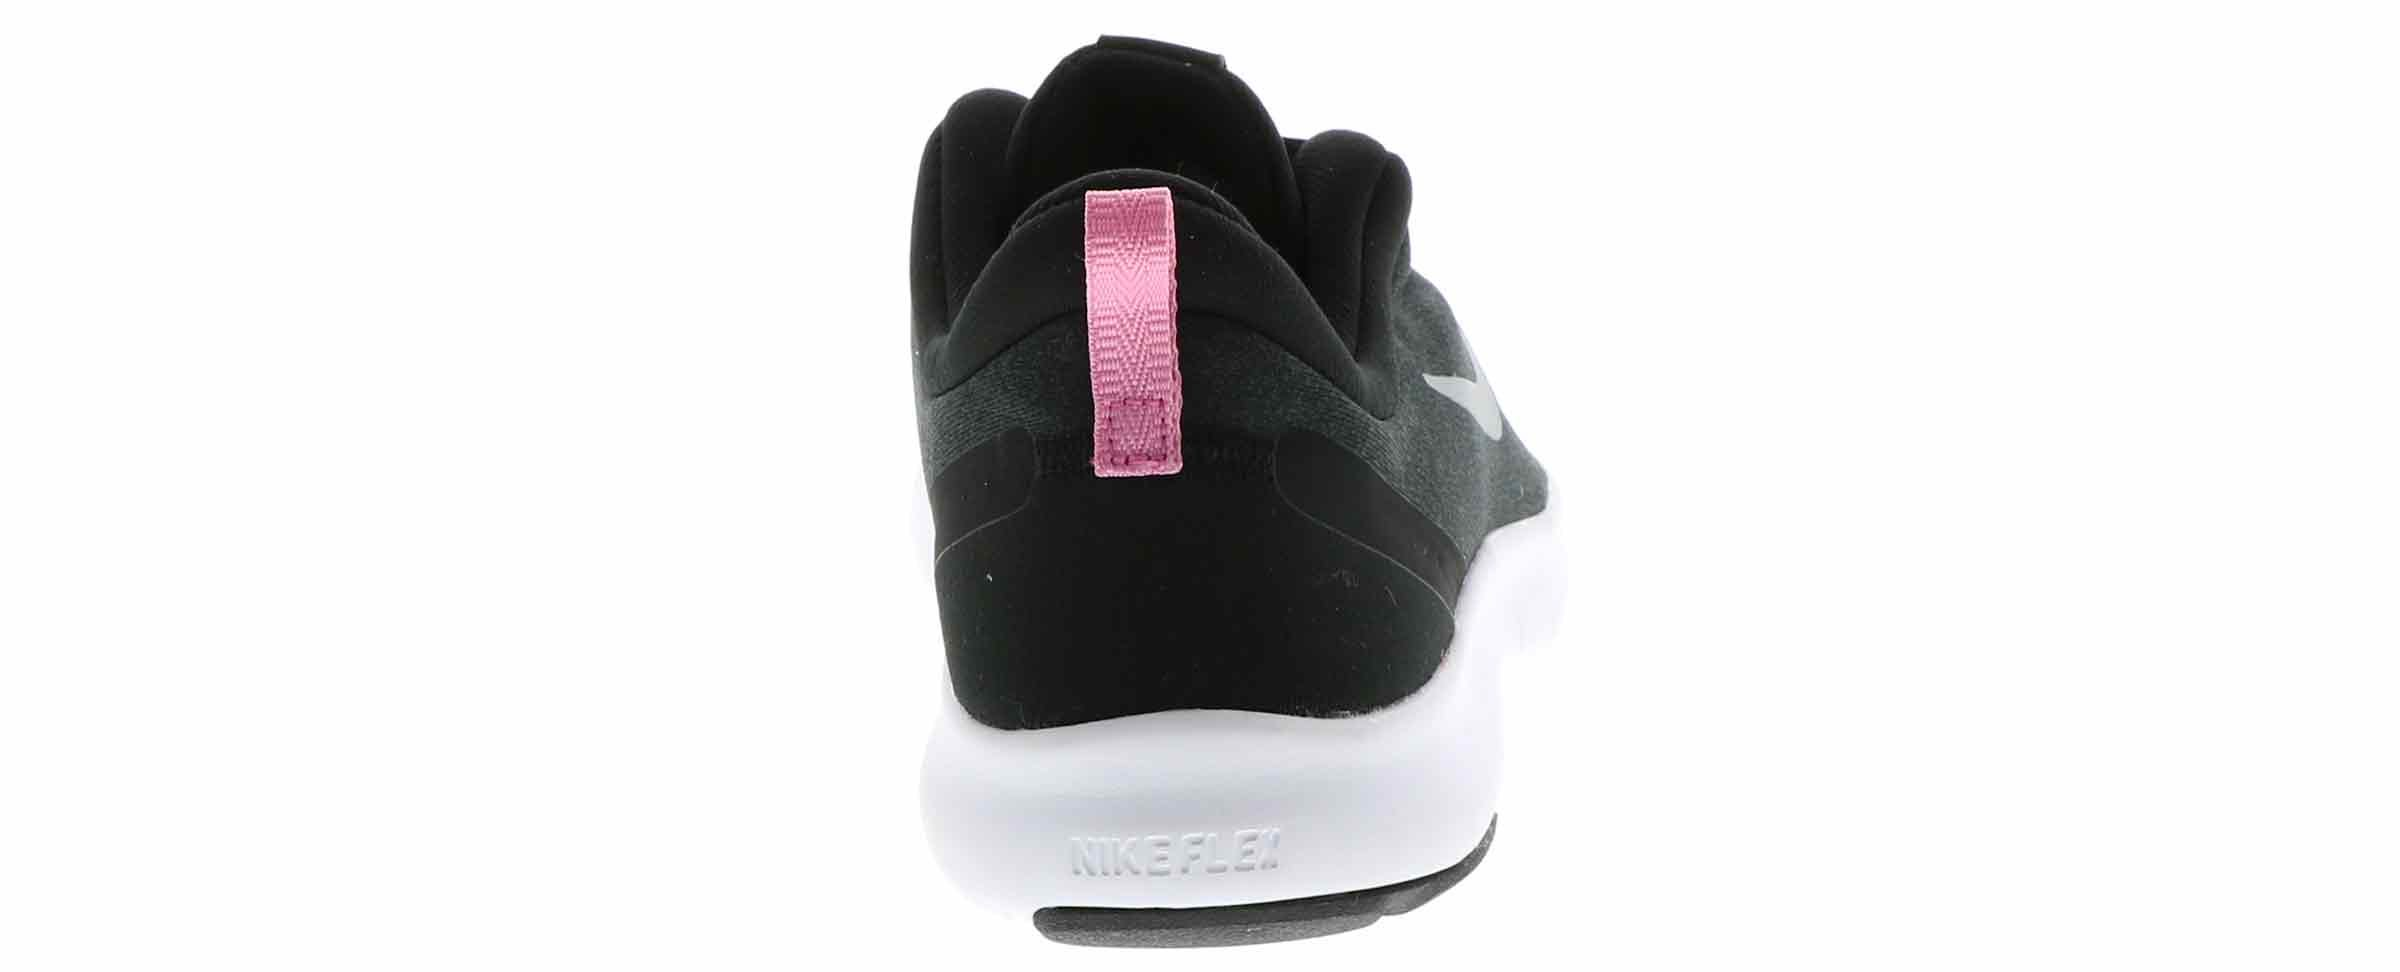 Kid's Nike Flex Experience 8 (4 6)